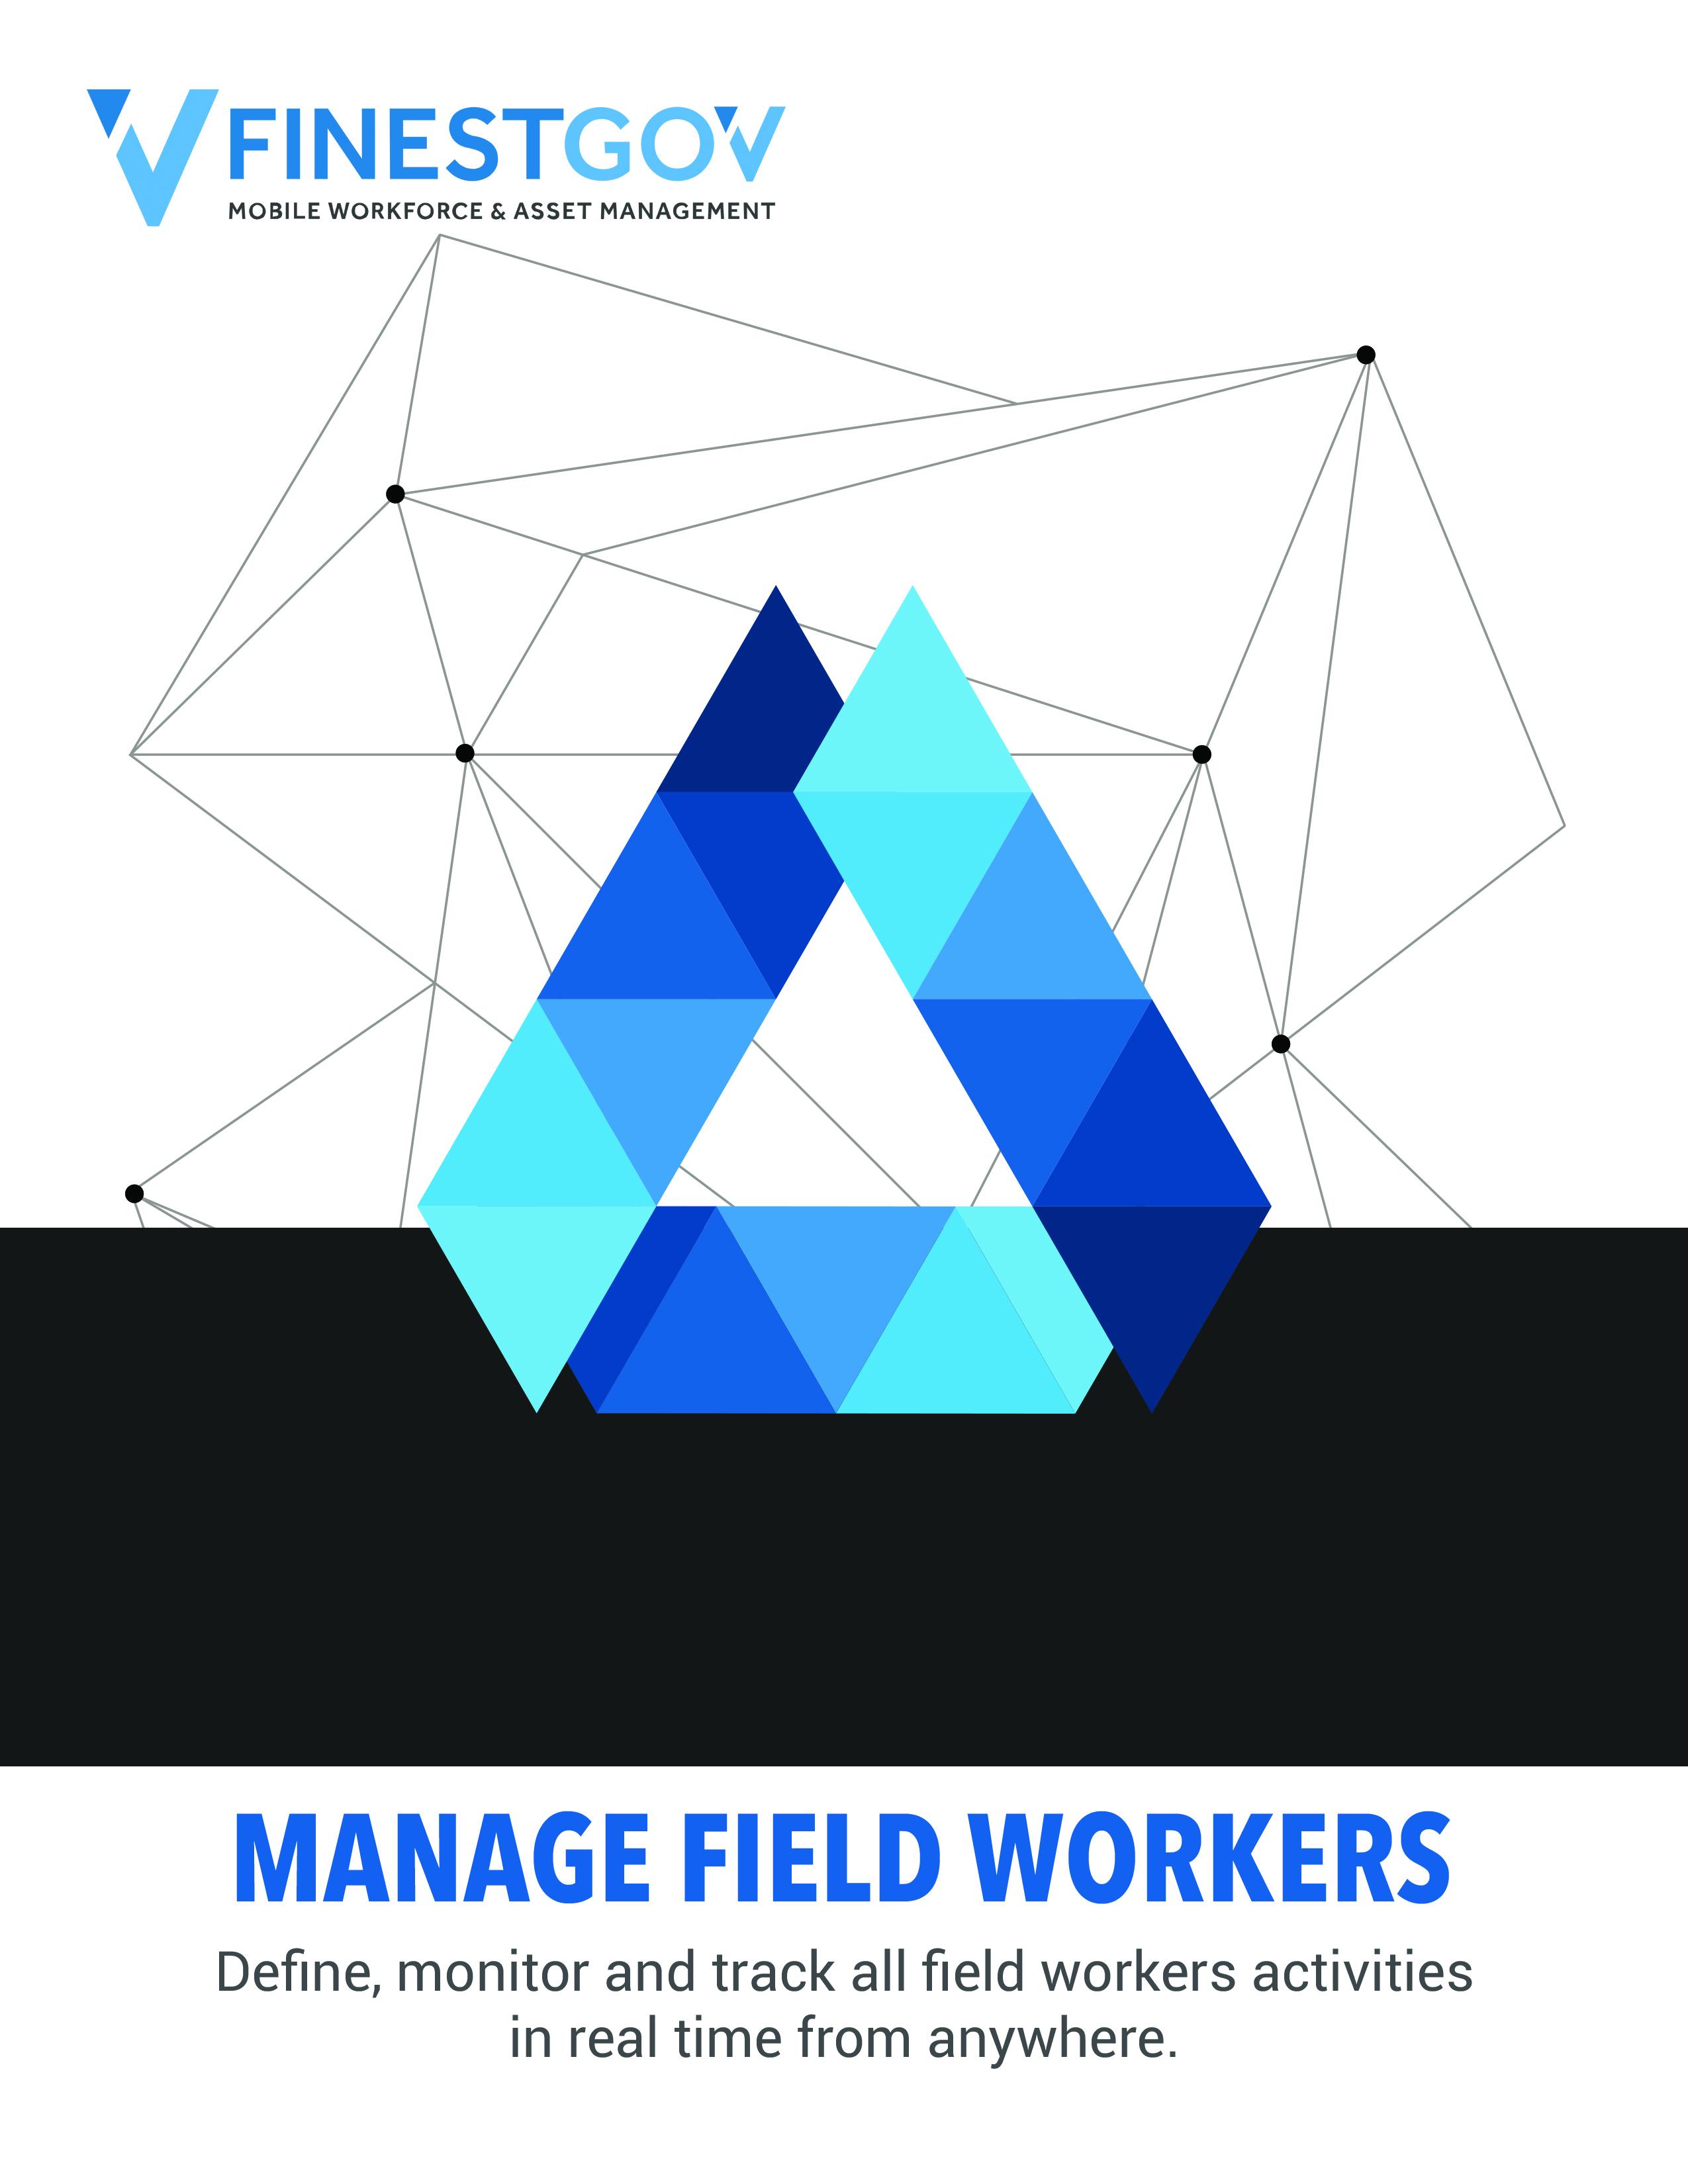 FinestGov-Managing-Field-Workers